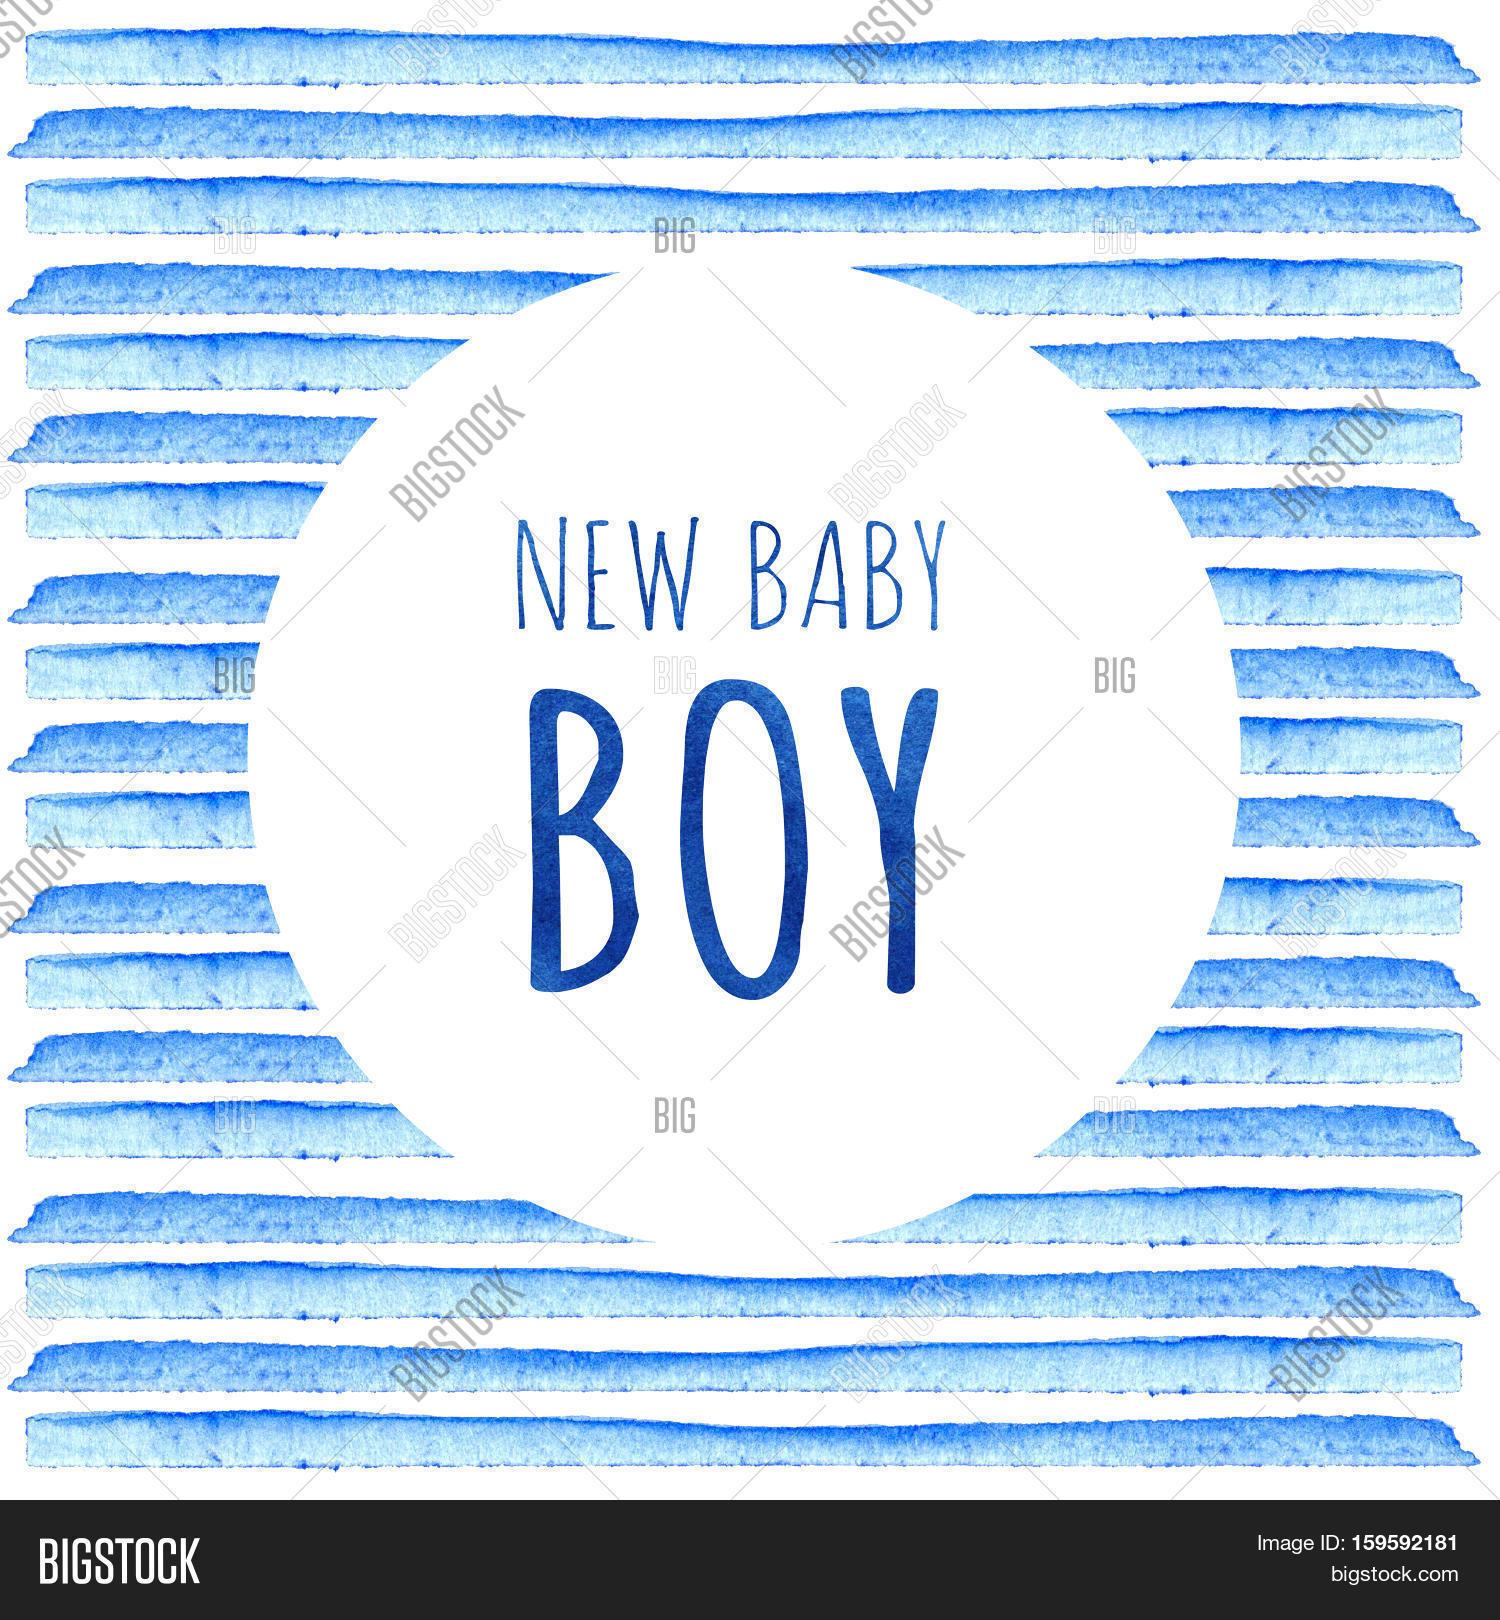 New Baby Boy Image Photo Free Trial Bigstock